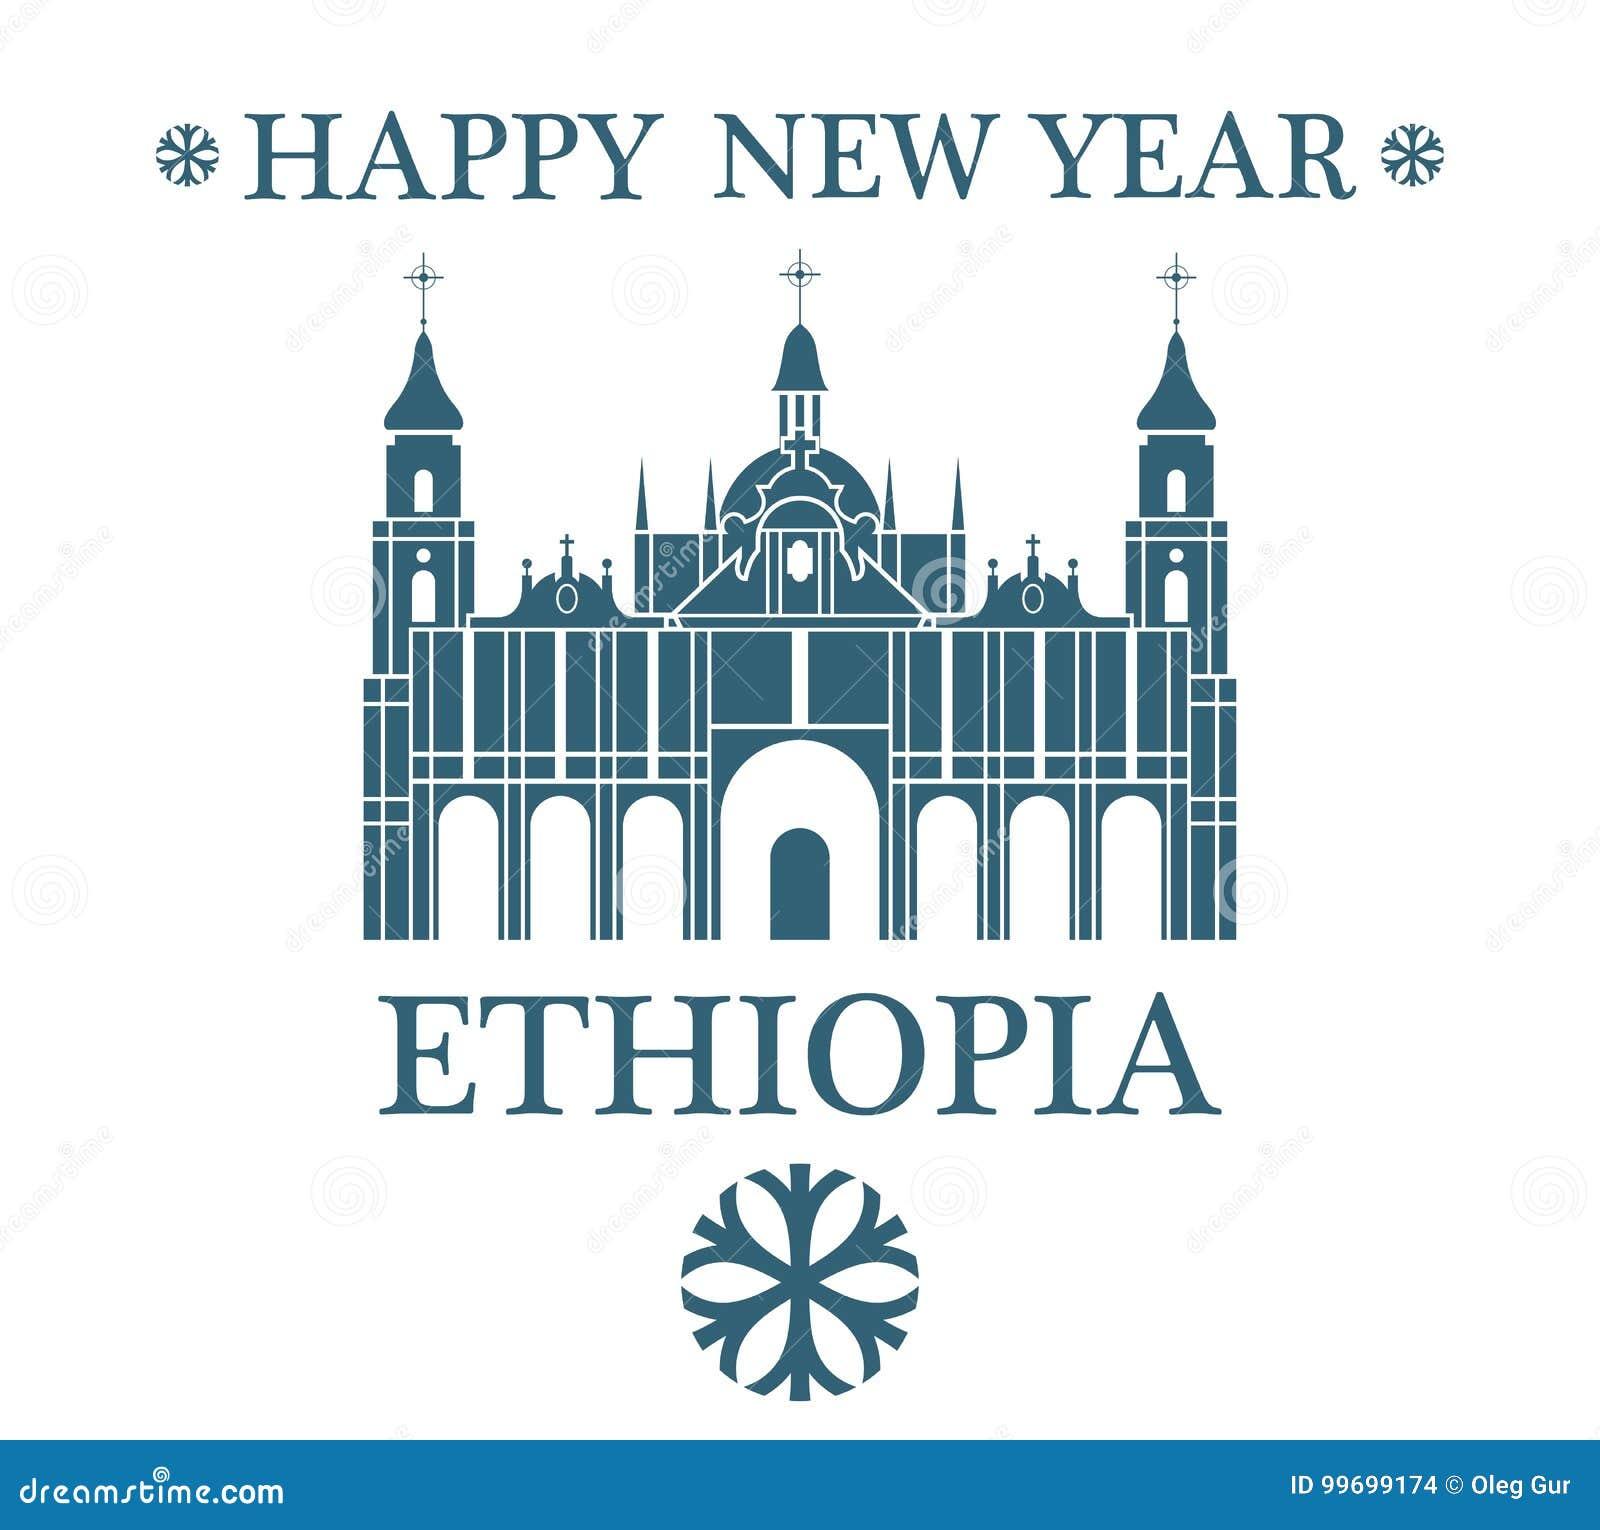 Greeting card ethiopia stock vector illustration of abeba 99699174 download greeting card ethiopia stock vector illustration of abeba 99699174 m4hsunfo